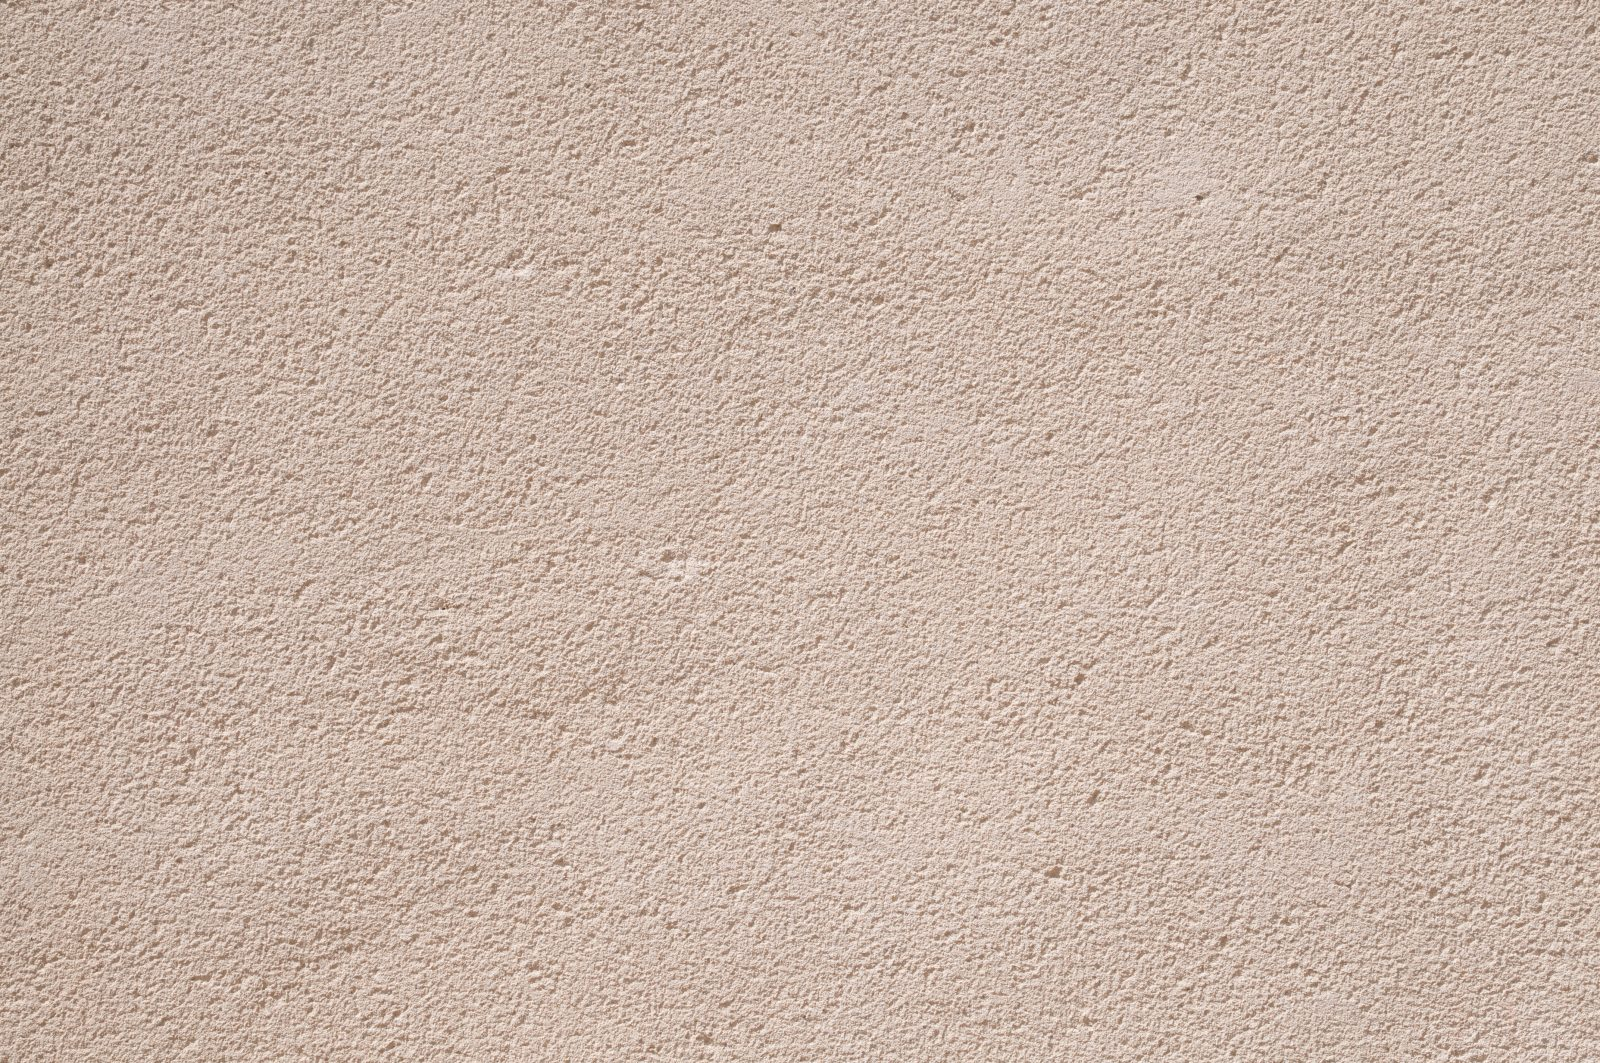 subtle grain plaster wall close-up